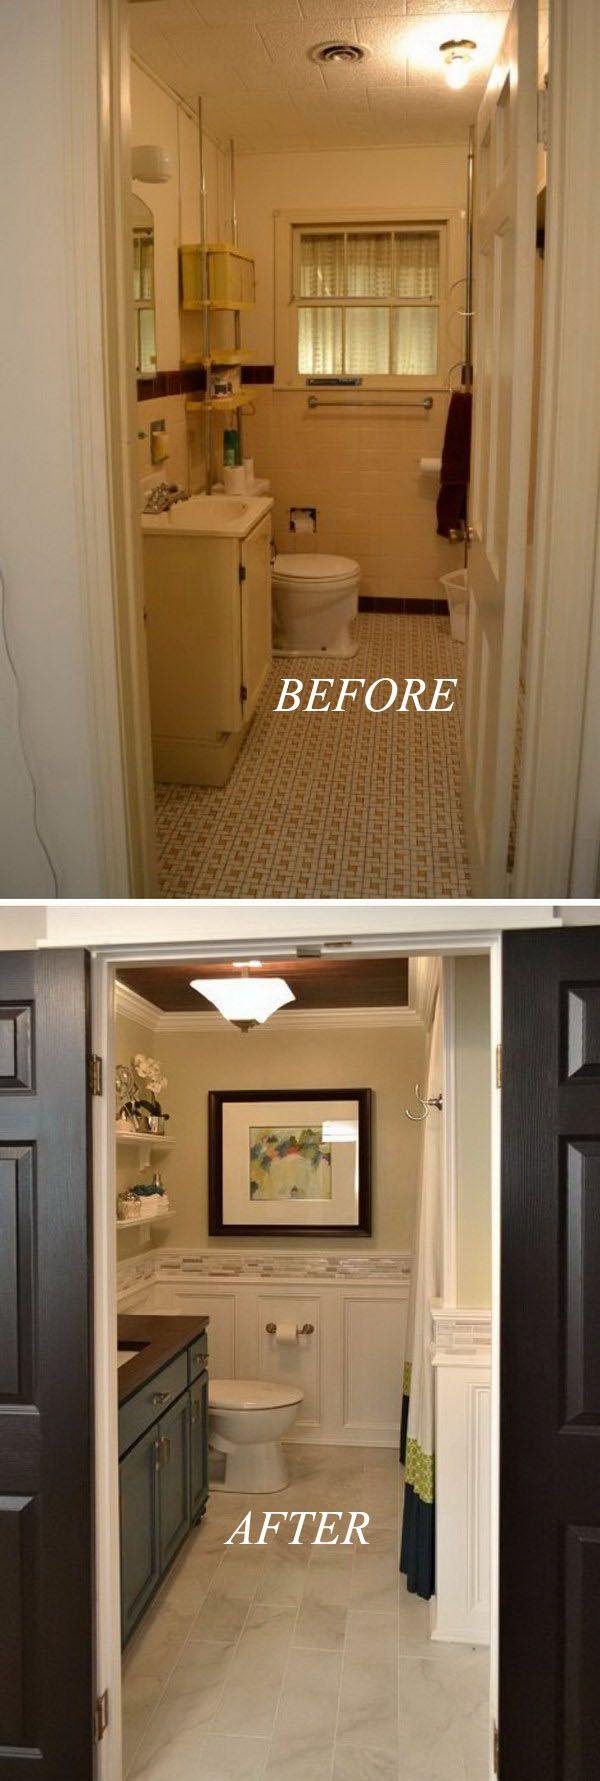 Hallway Bathroom Remodel I Ve Never Seen Tile Rail Over The Molding I Like It Small Bathroom Remodel Small Remodel Small Bathroom Makeover